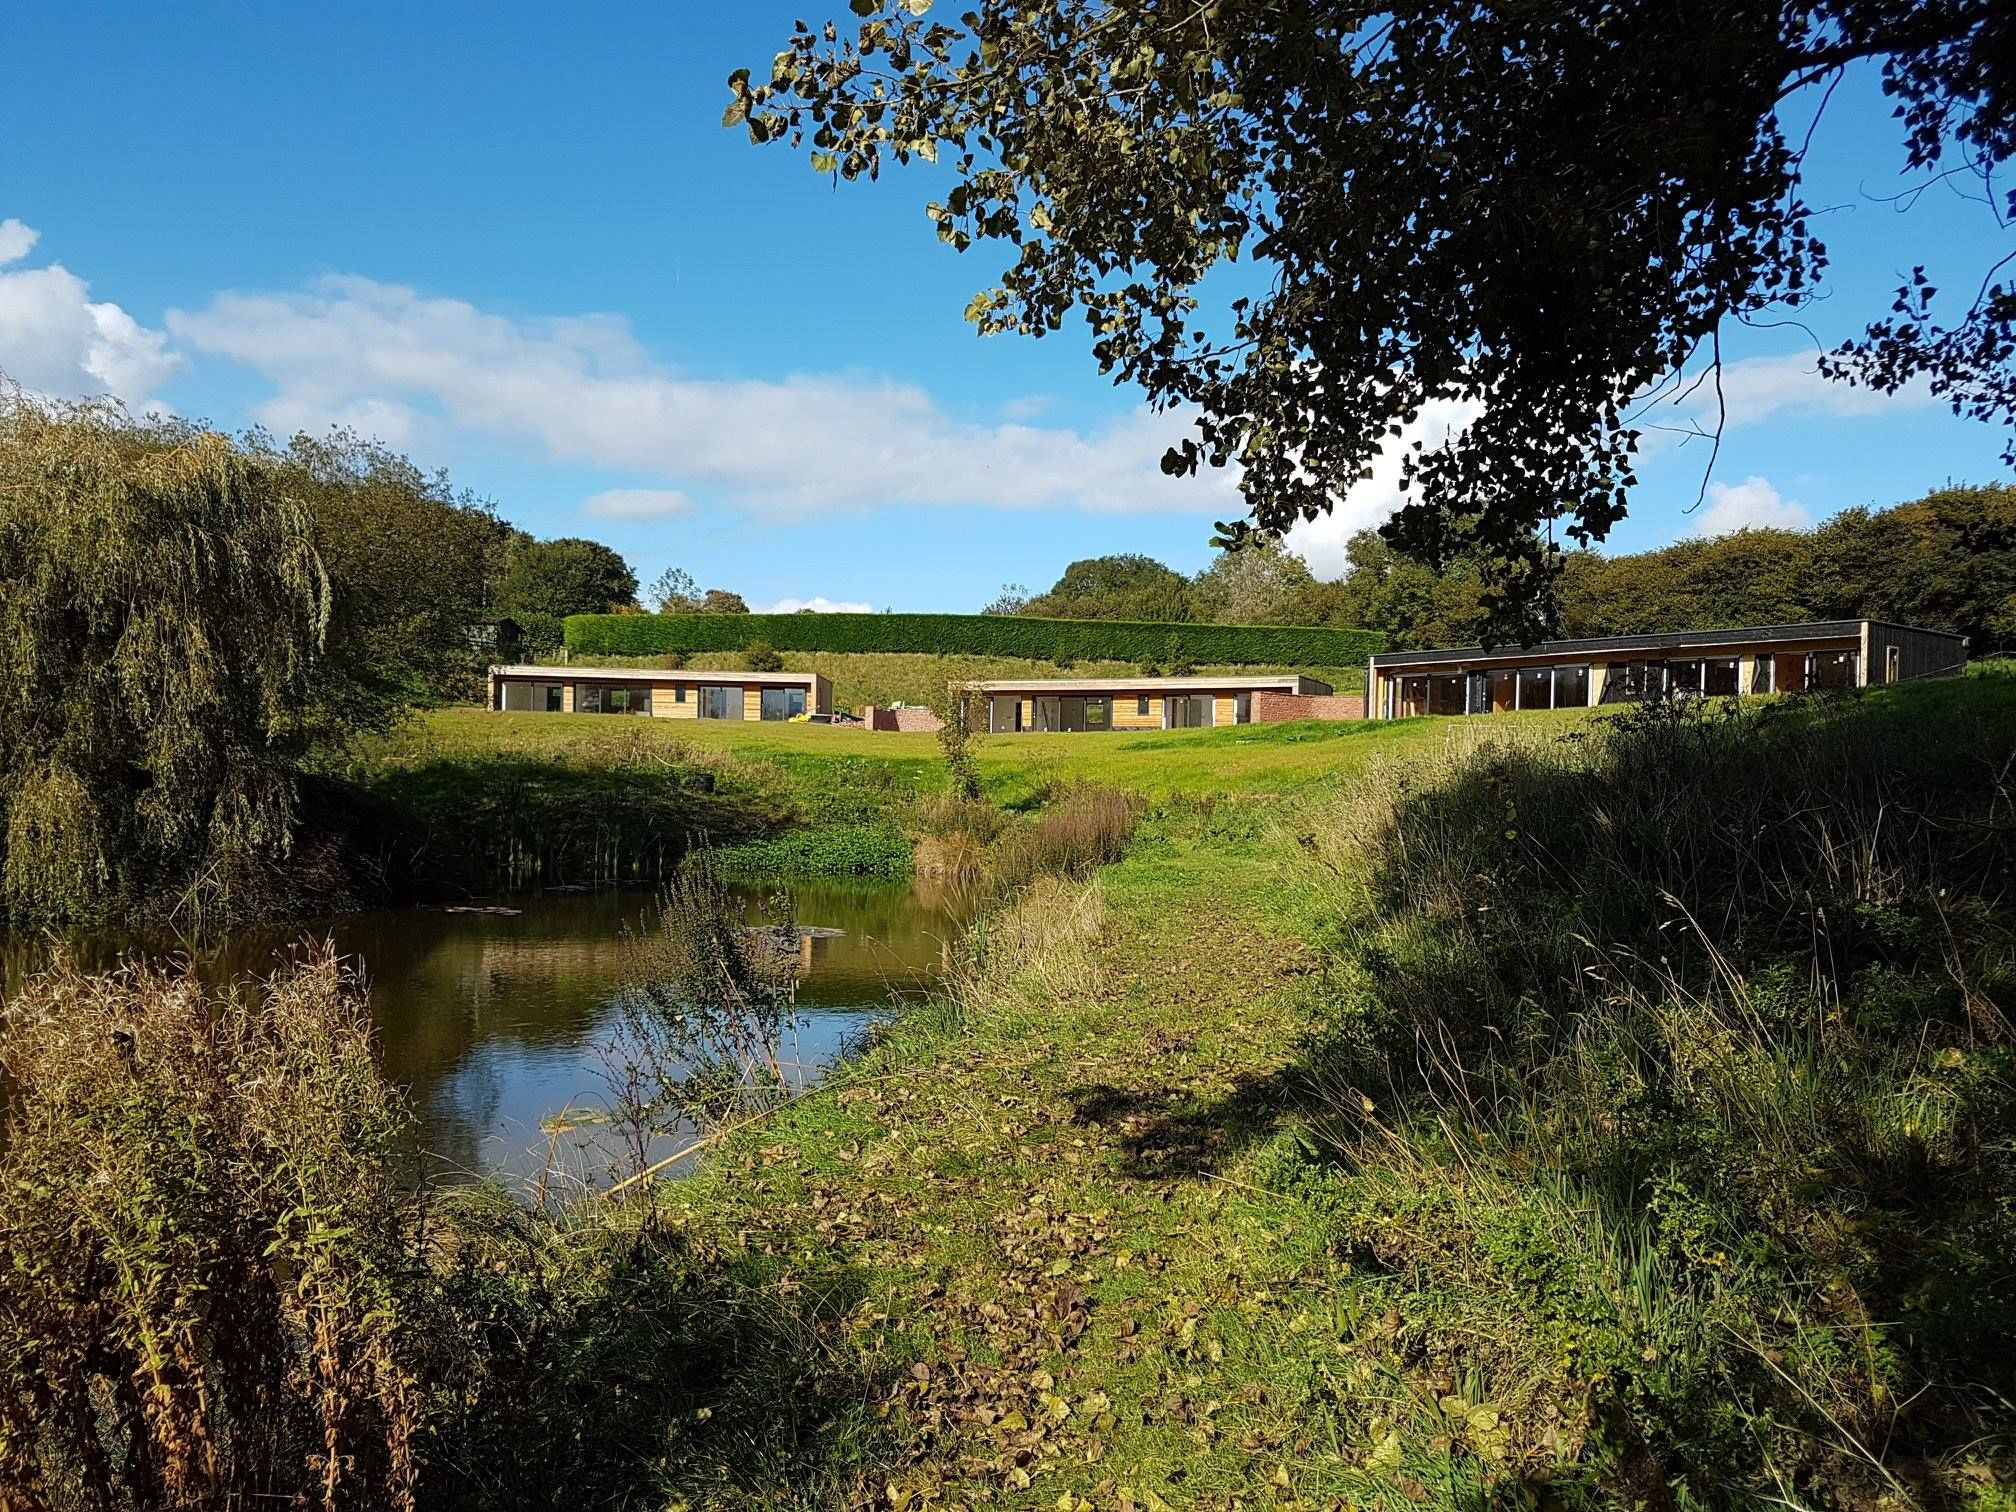 West Pitt Lakes Lodges Whitnage Tiverton Devon England Contempory Lodges Contempory Architecture Self Cateri Devon Cottages Holiday Cottage Lake Lodge